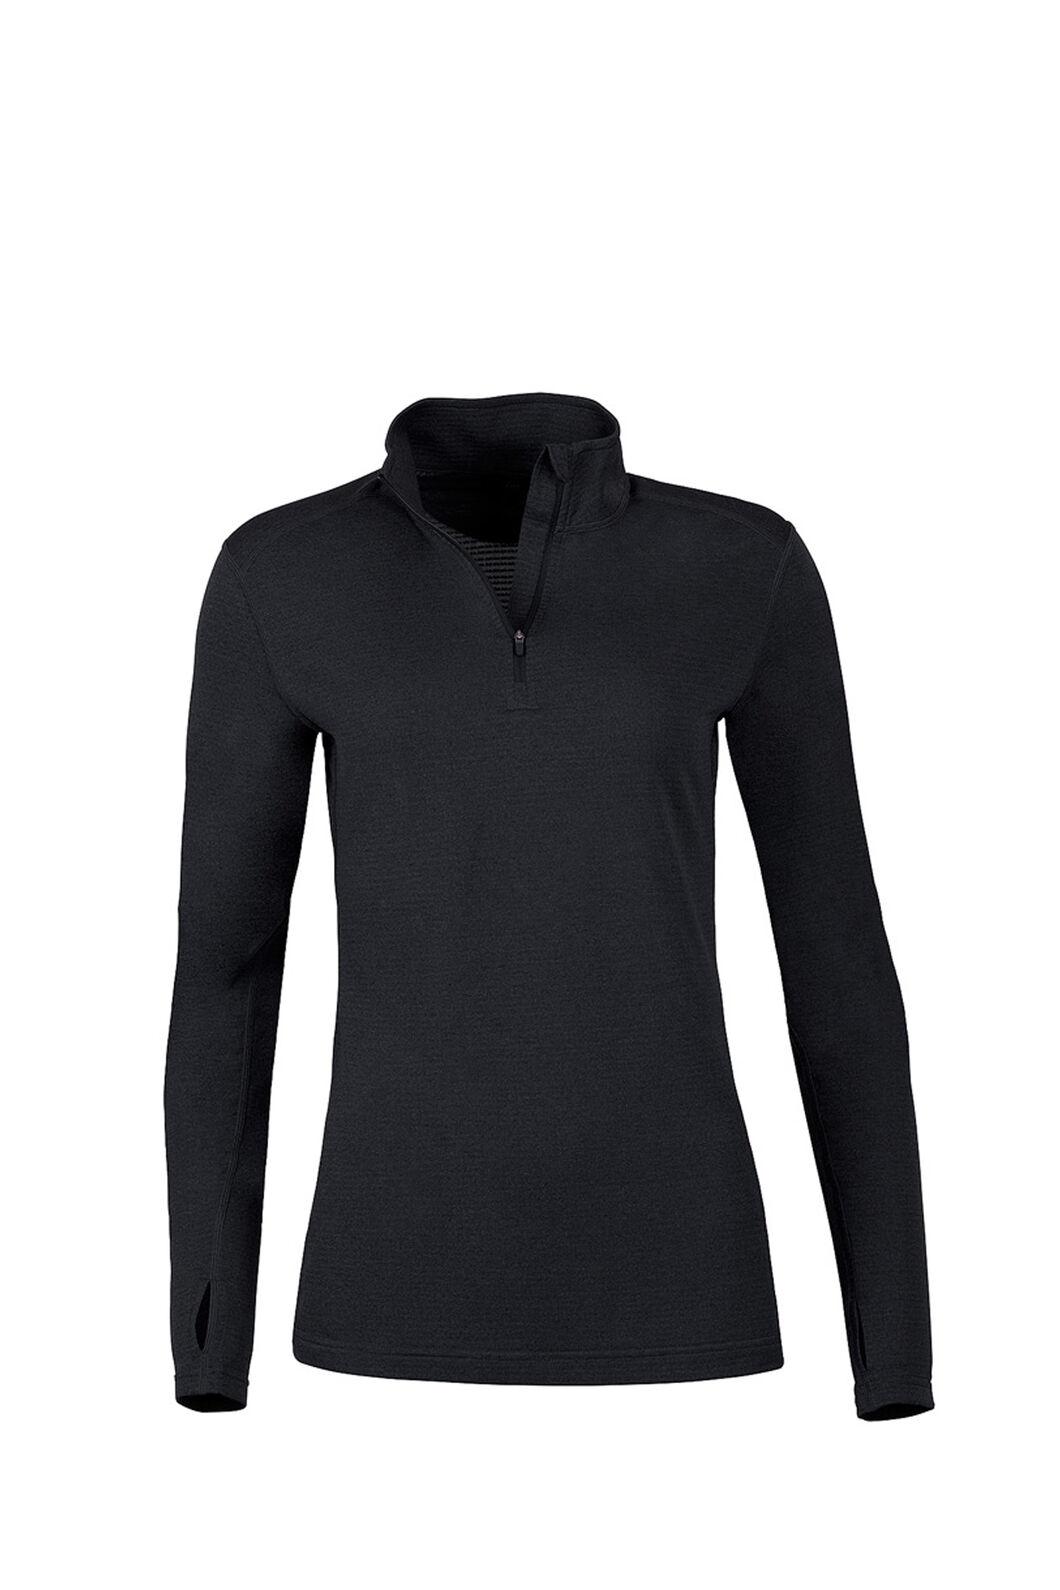 Macpac Prothermal Polartec® Long Sleeve Top — Women's, Black, hi-res